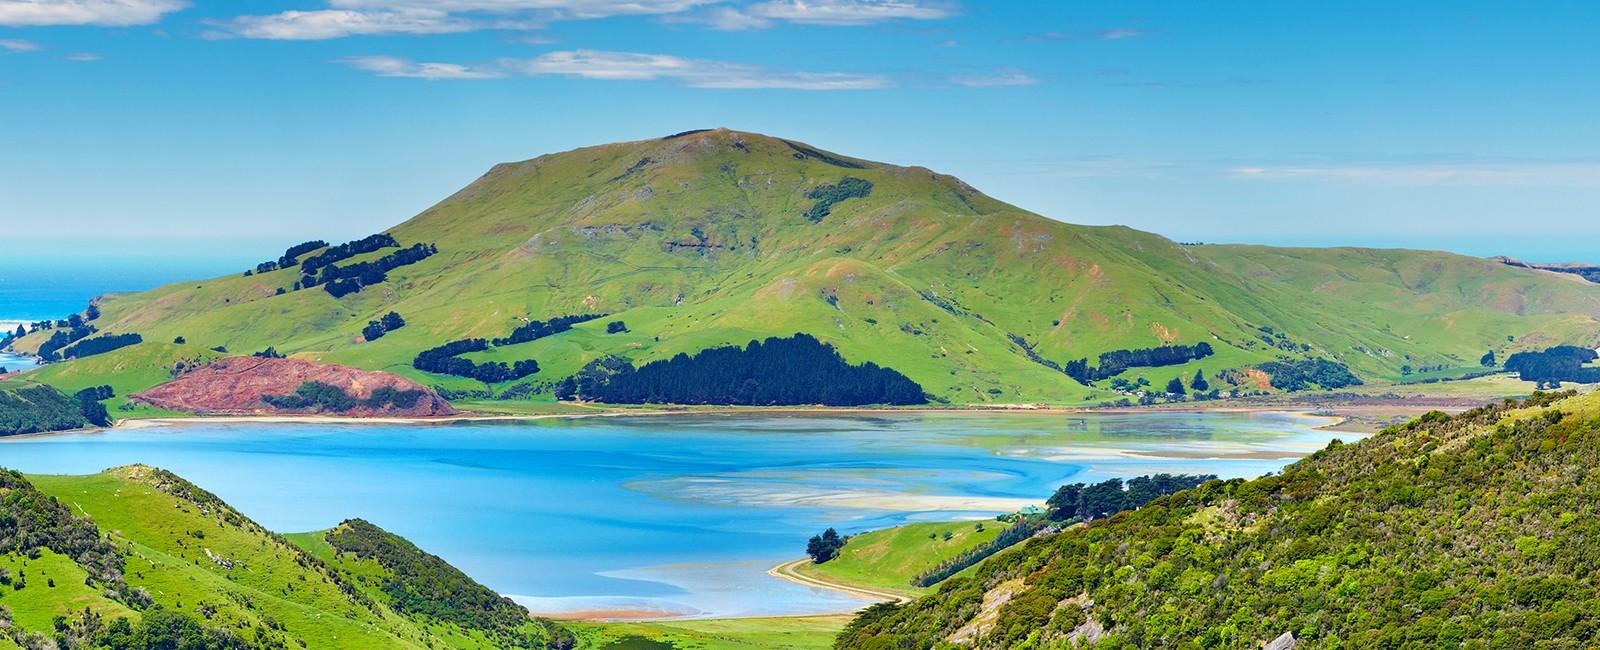 nouvelle-zelande-azurexpat